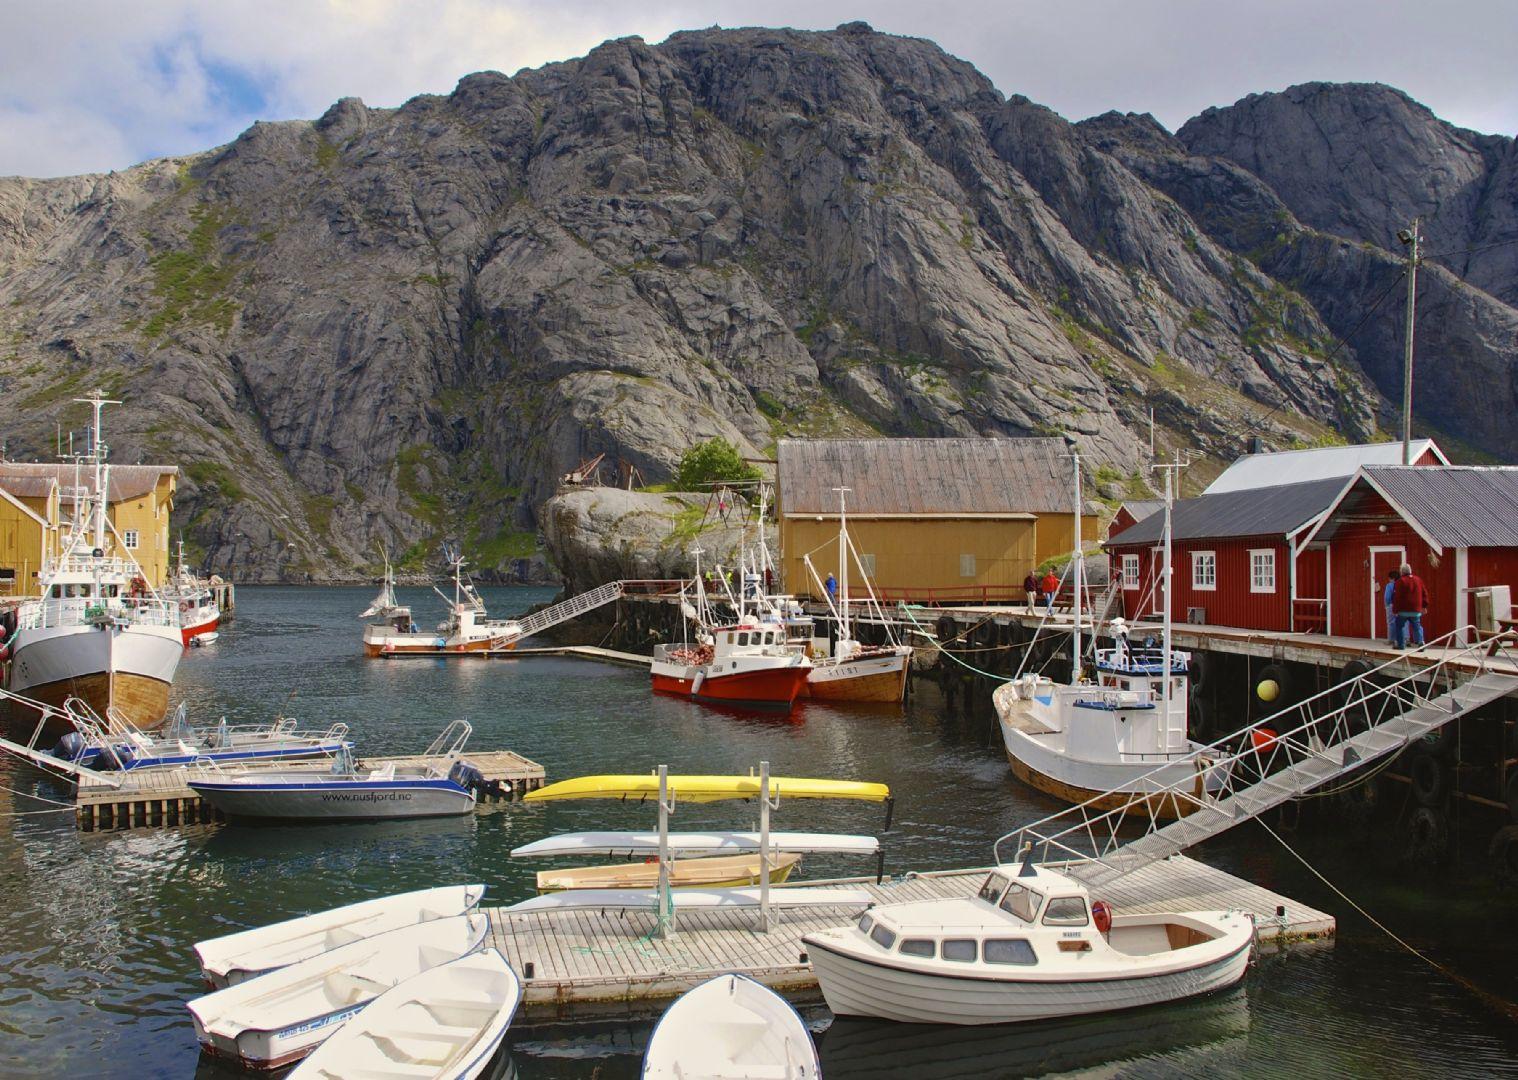 _Customer.103820.17293.jpg - Norway - Lofoten Islands - Self-Guided Leisure Cycling Holiday - Leisure Cycling